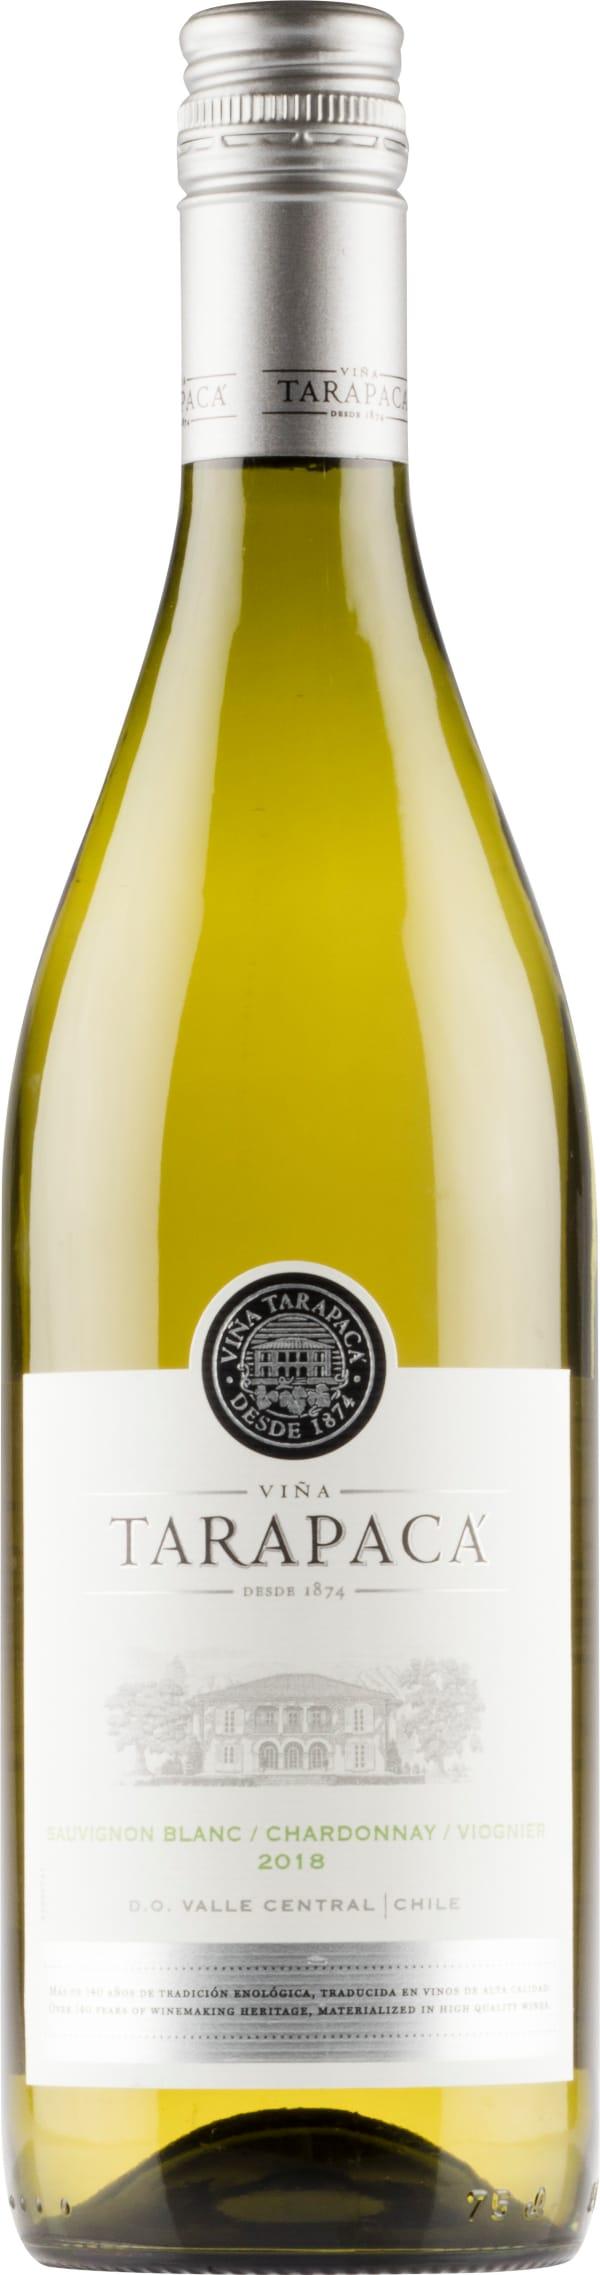 Tarapacá Sauvignon Blanc Chardonnay Viognier 2019